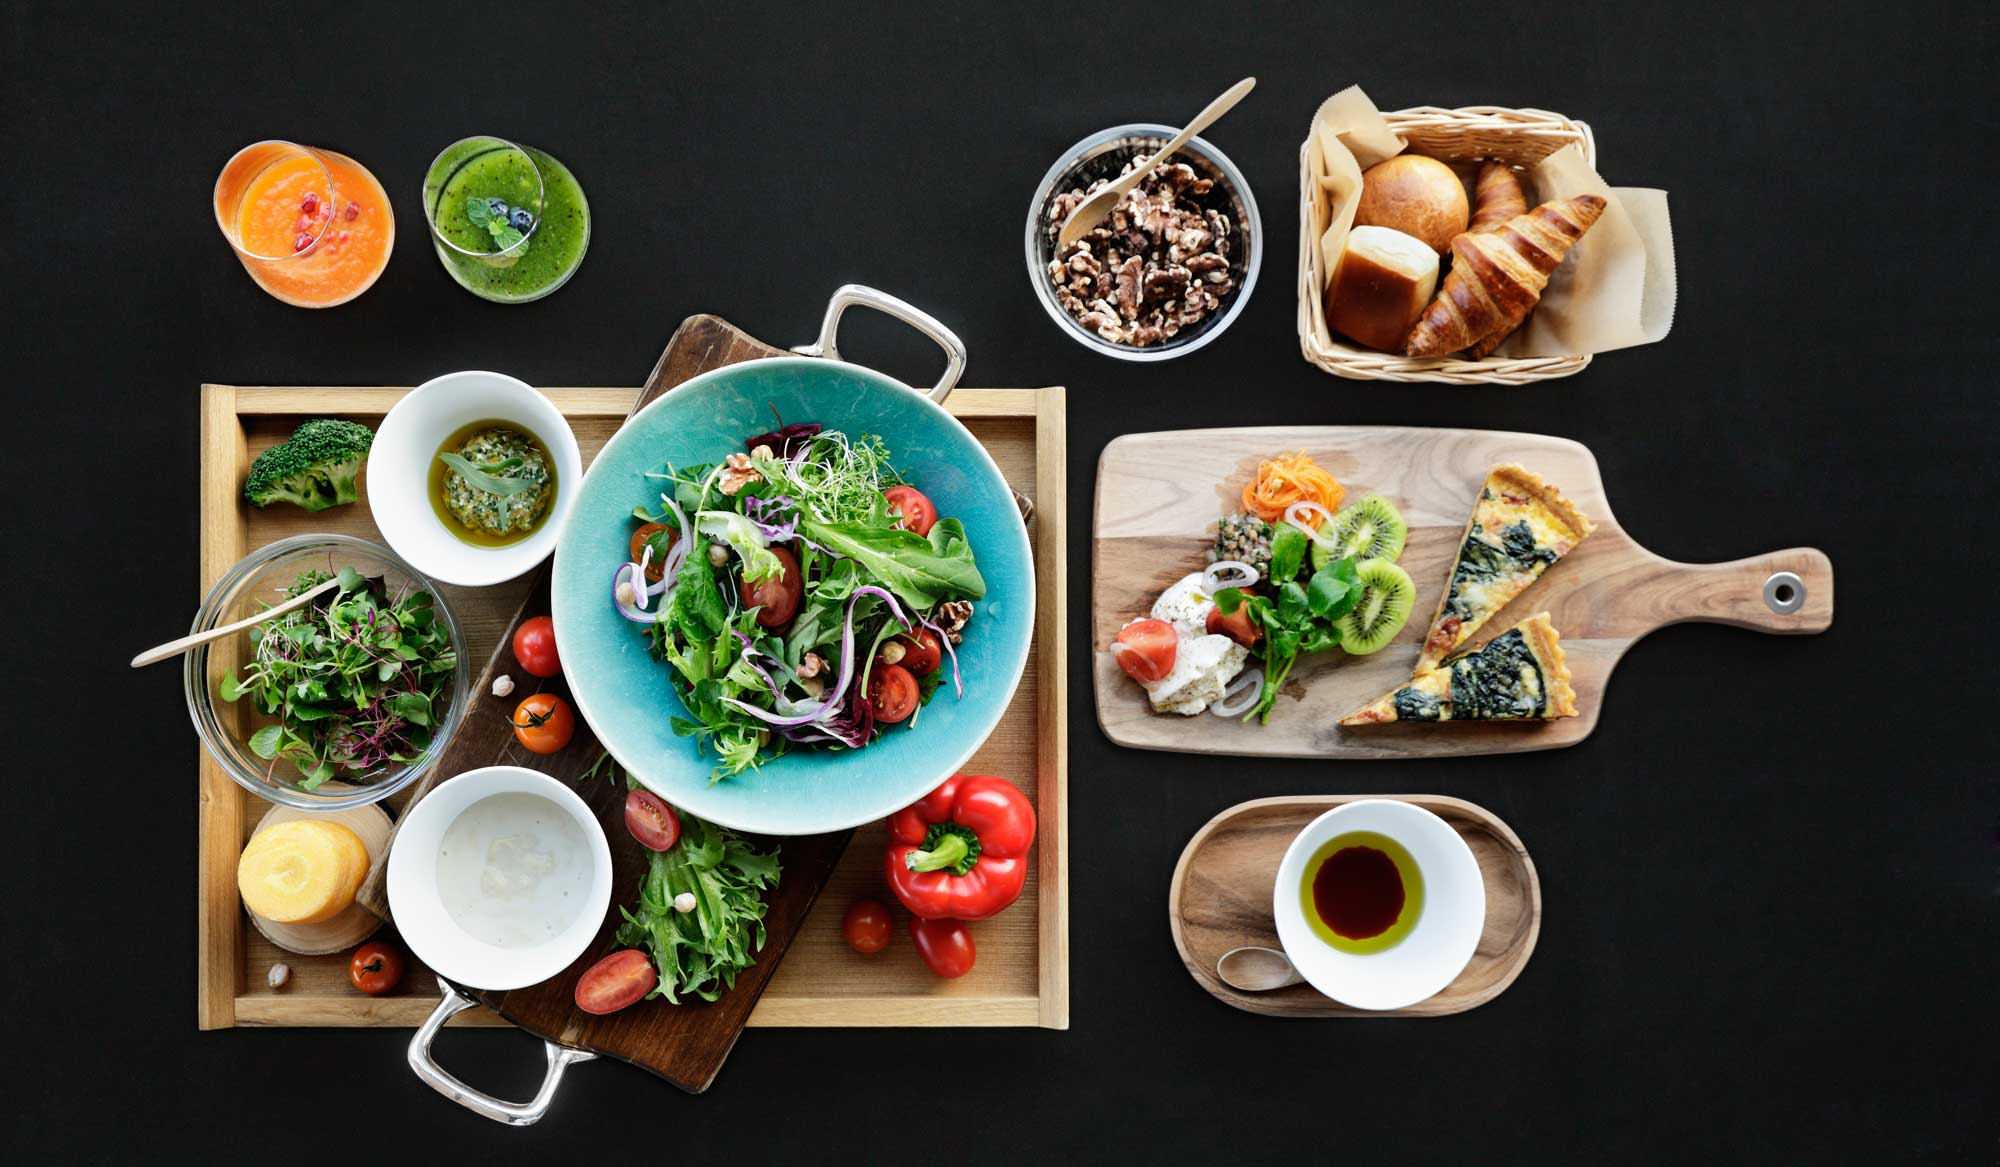 Hoshino Resorts L'Hotel de Hiei|近江の発酵食「お酢」と野菜の朝食で心身をリフレッシュ